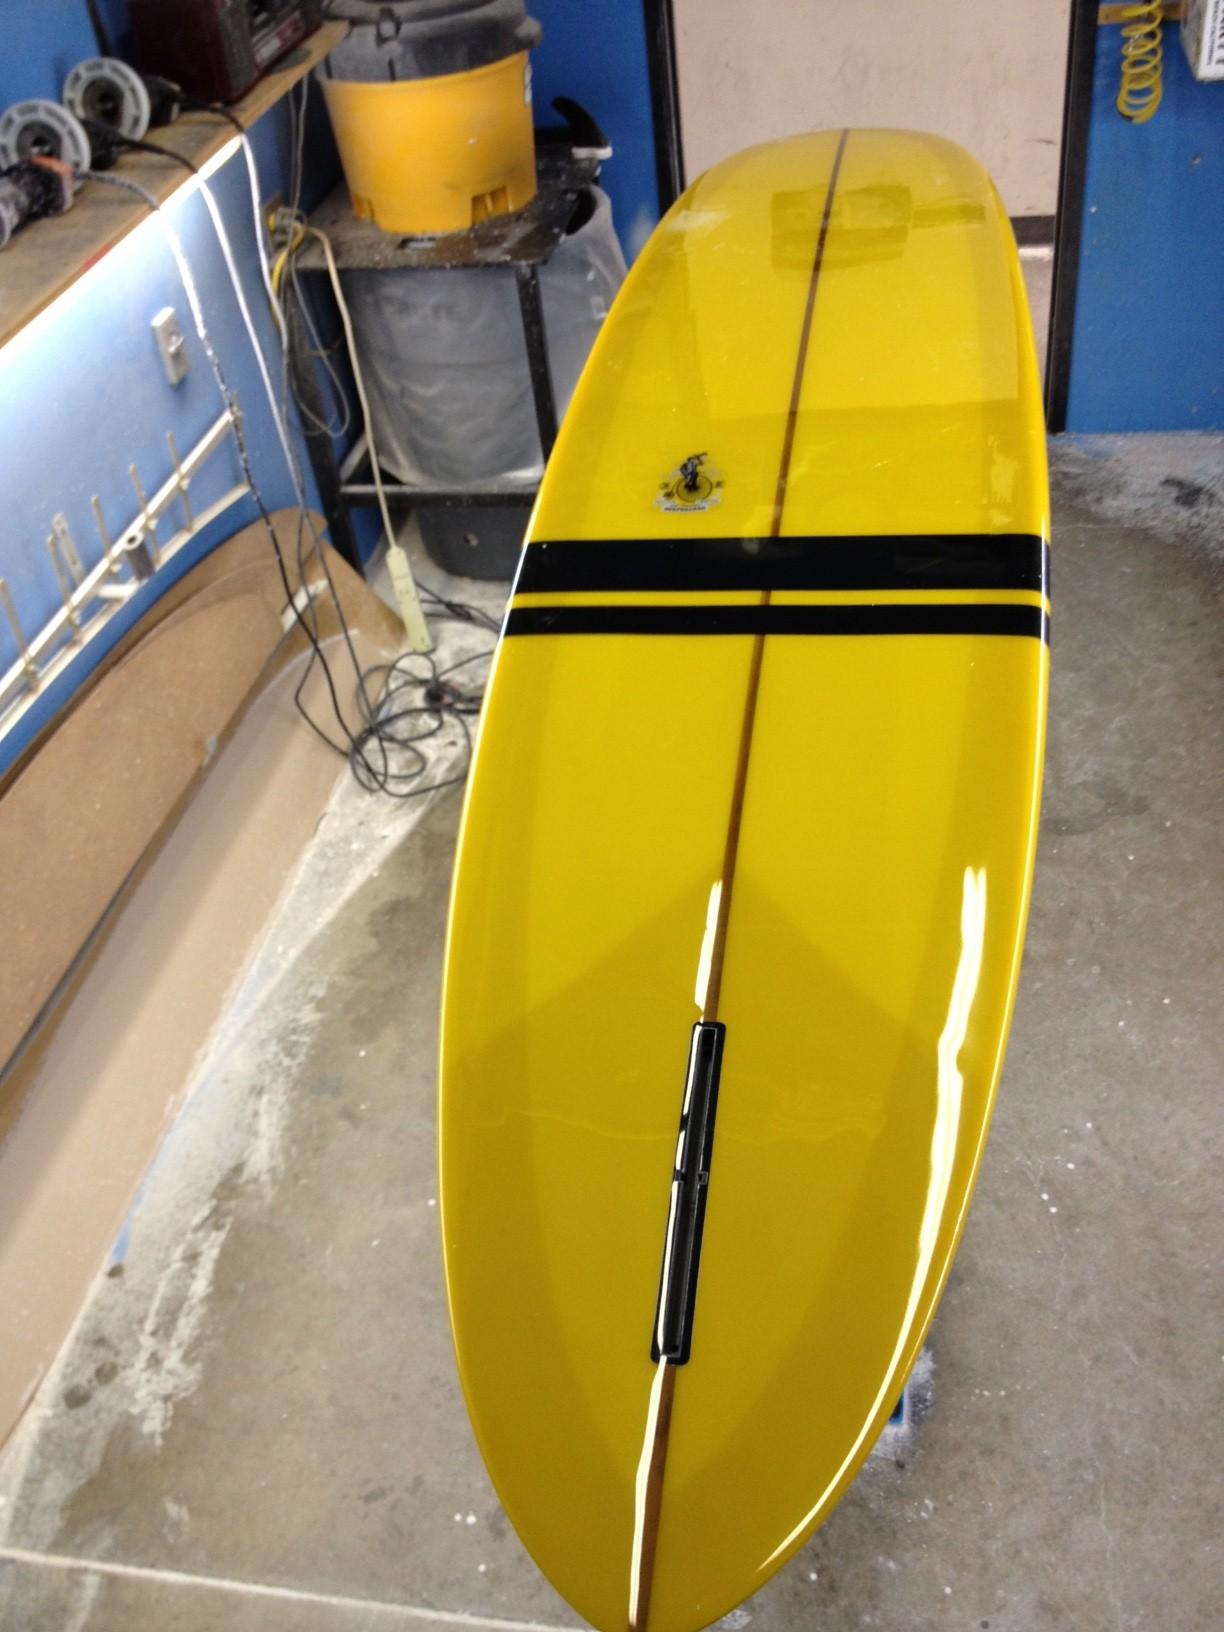 Daddy O Custom EC Surfboard Handmade in Orange County, CA USA